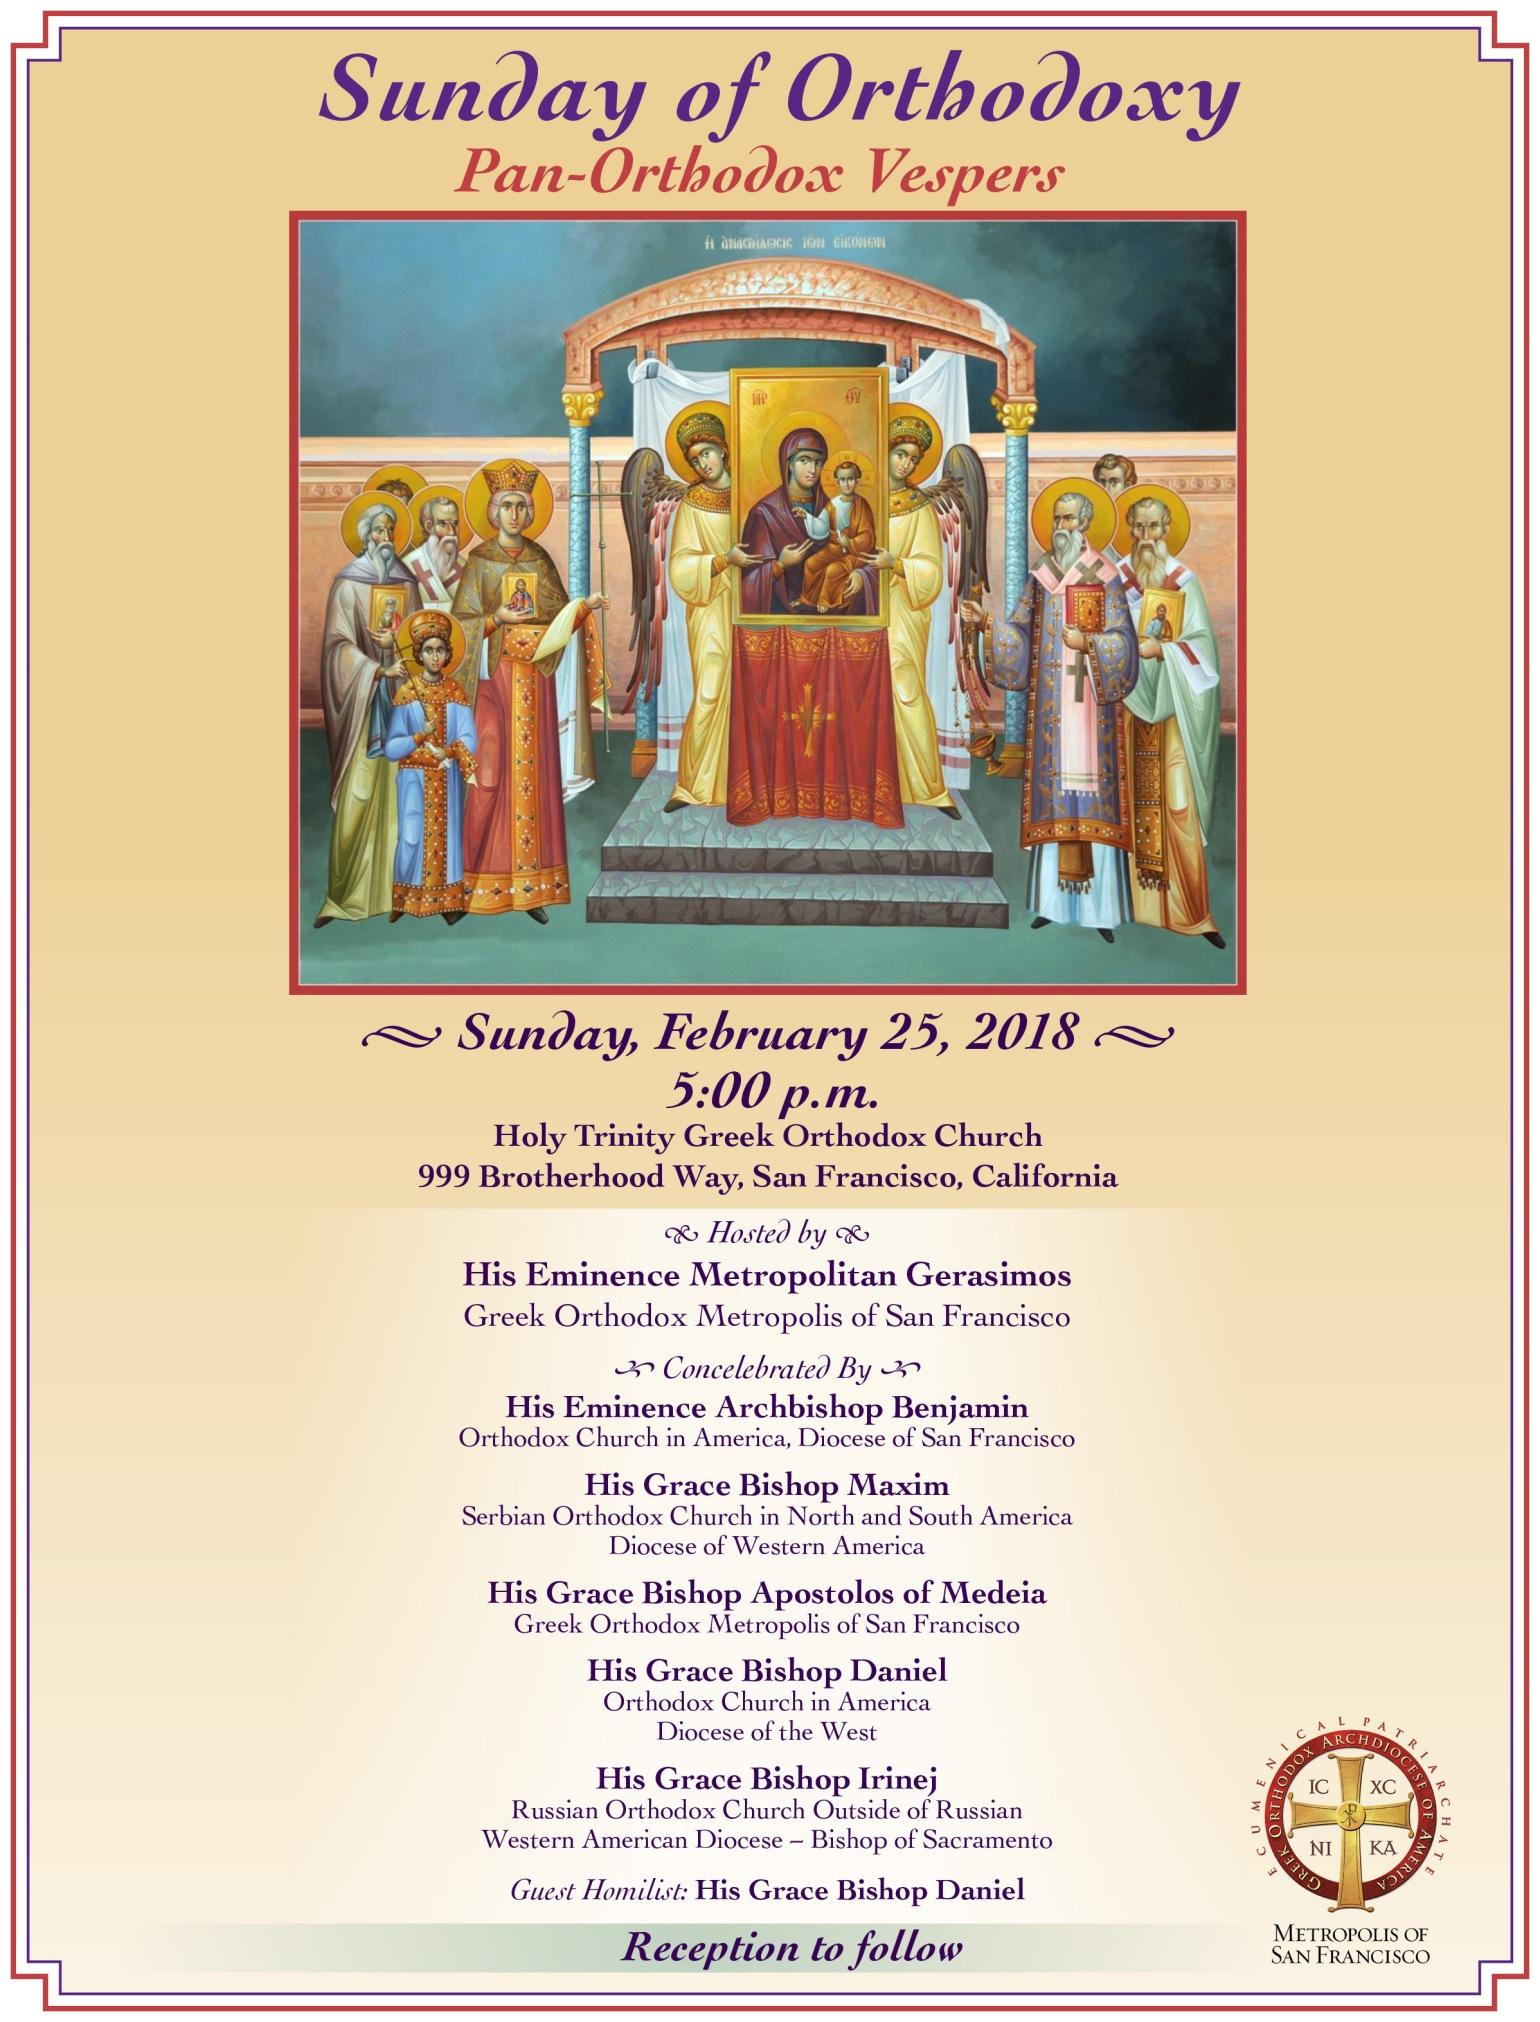 Sunday of Orthodoxy Vespers 2018 - San Francisco